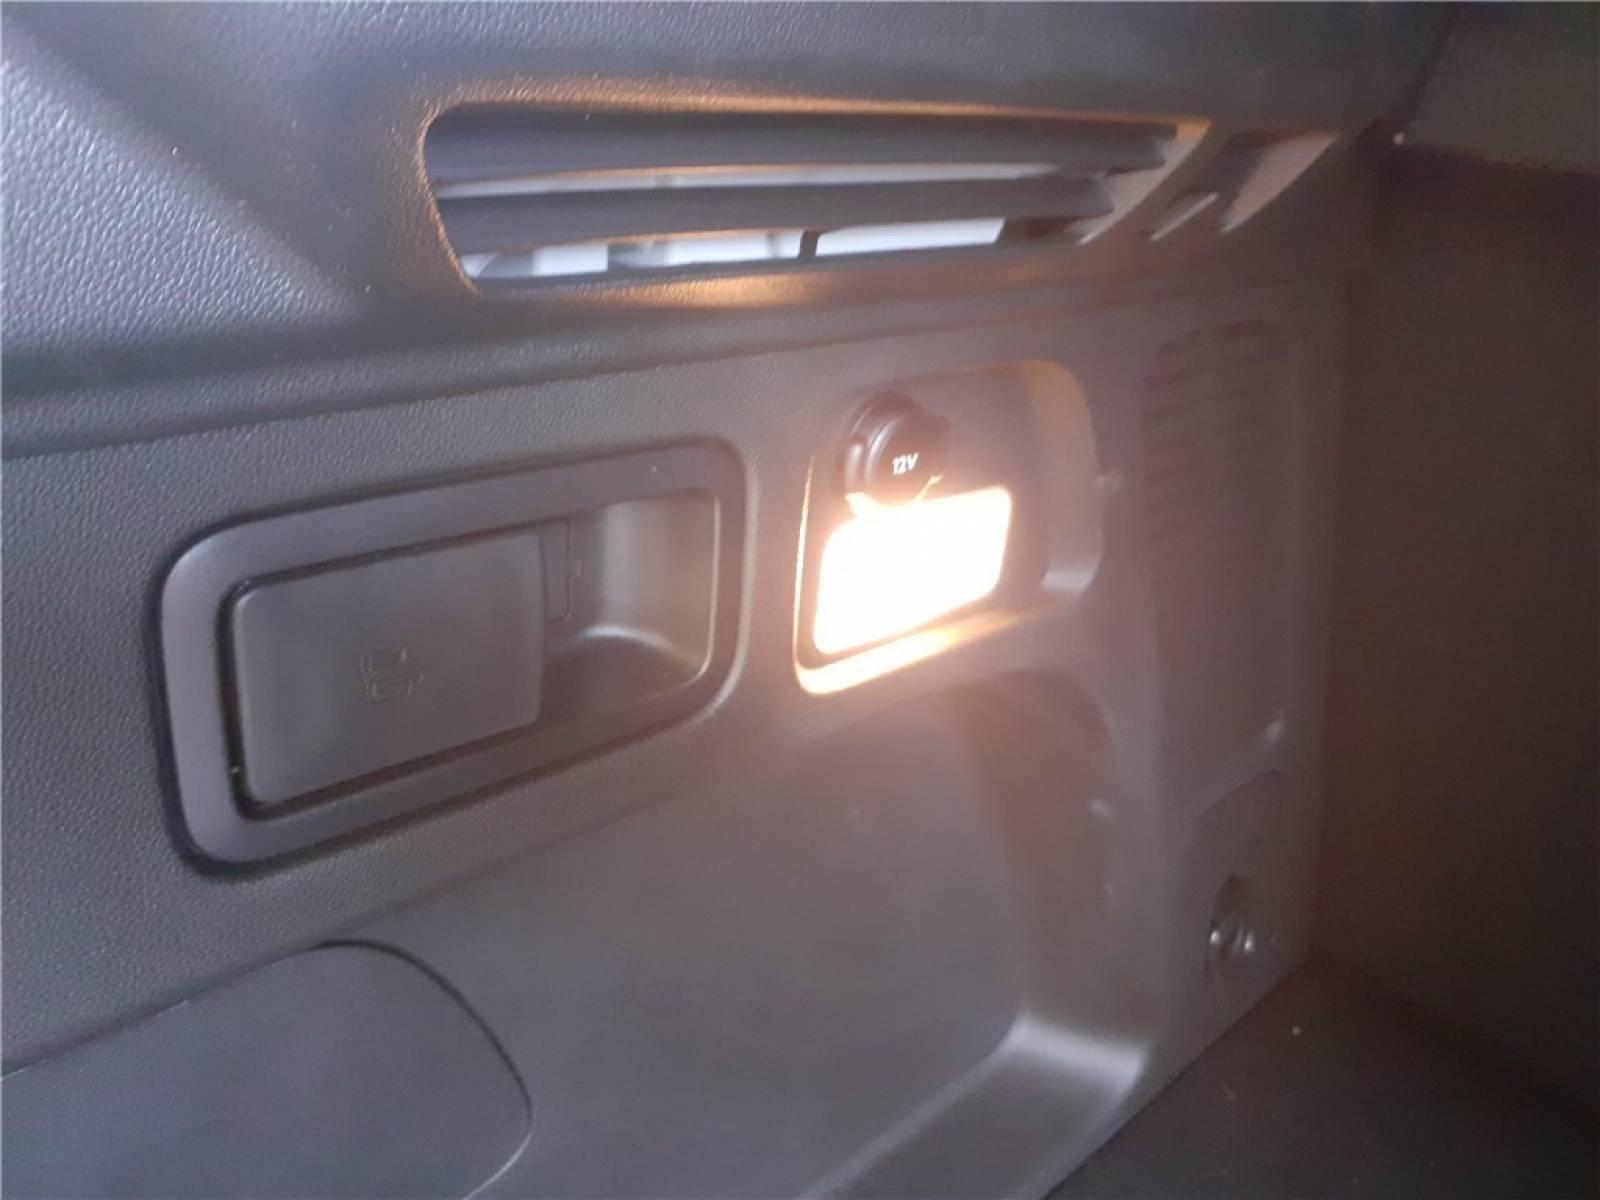 OPEL Grandland X Hybrid 225 ch BVA8 - véhicule d'occasion - Groupe Guillet - Opel Magicauto - Chalon-sur-Saône - 71380 - Saint-Marcel - 15